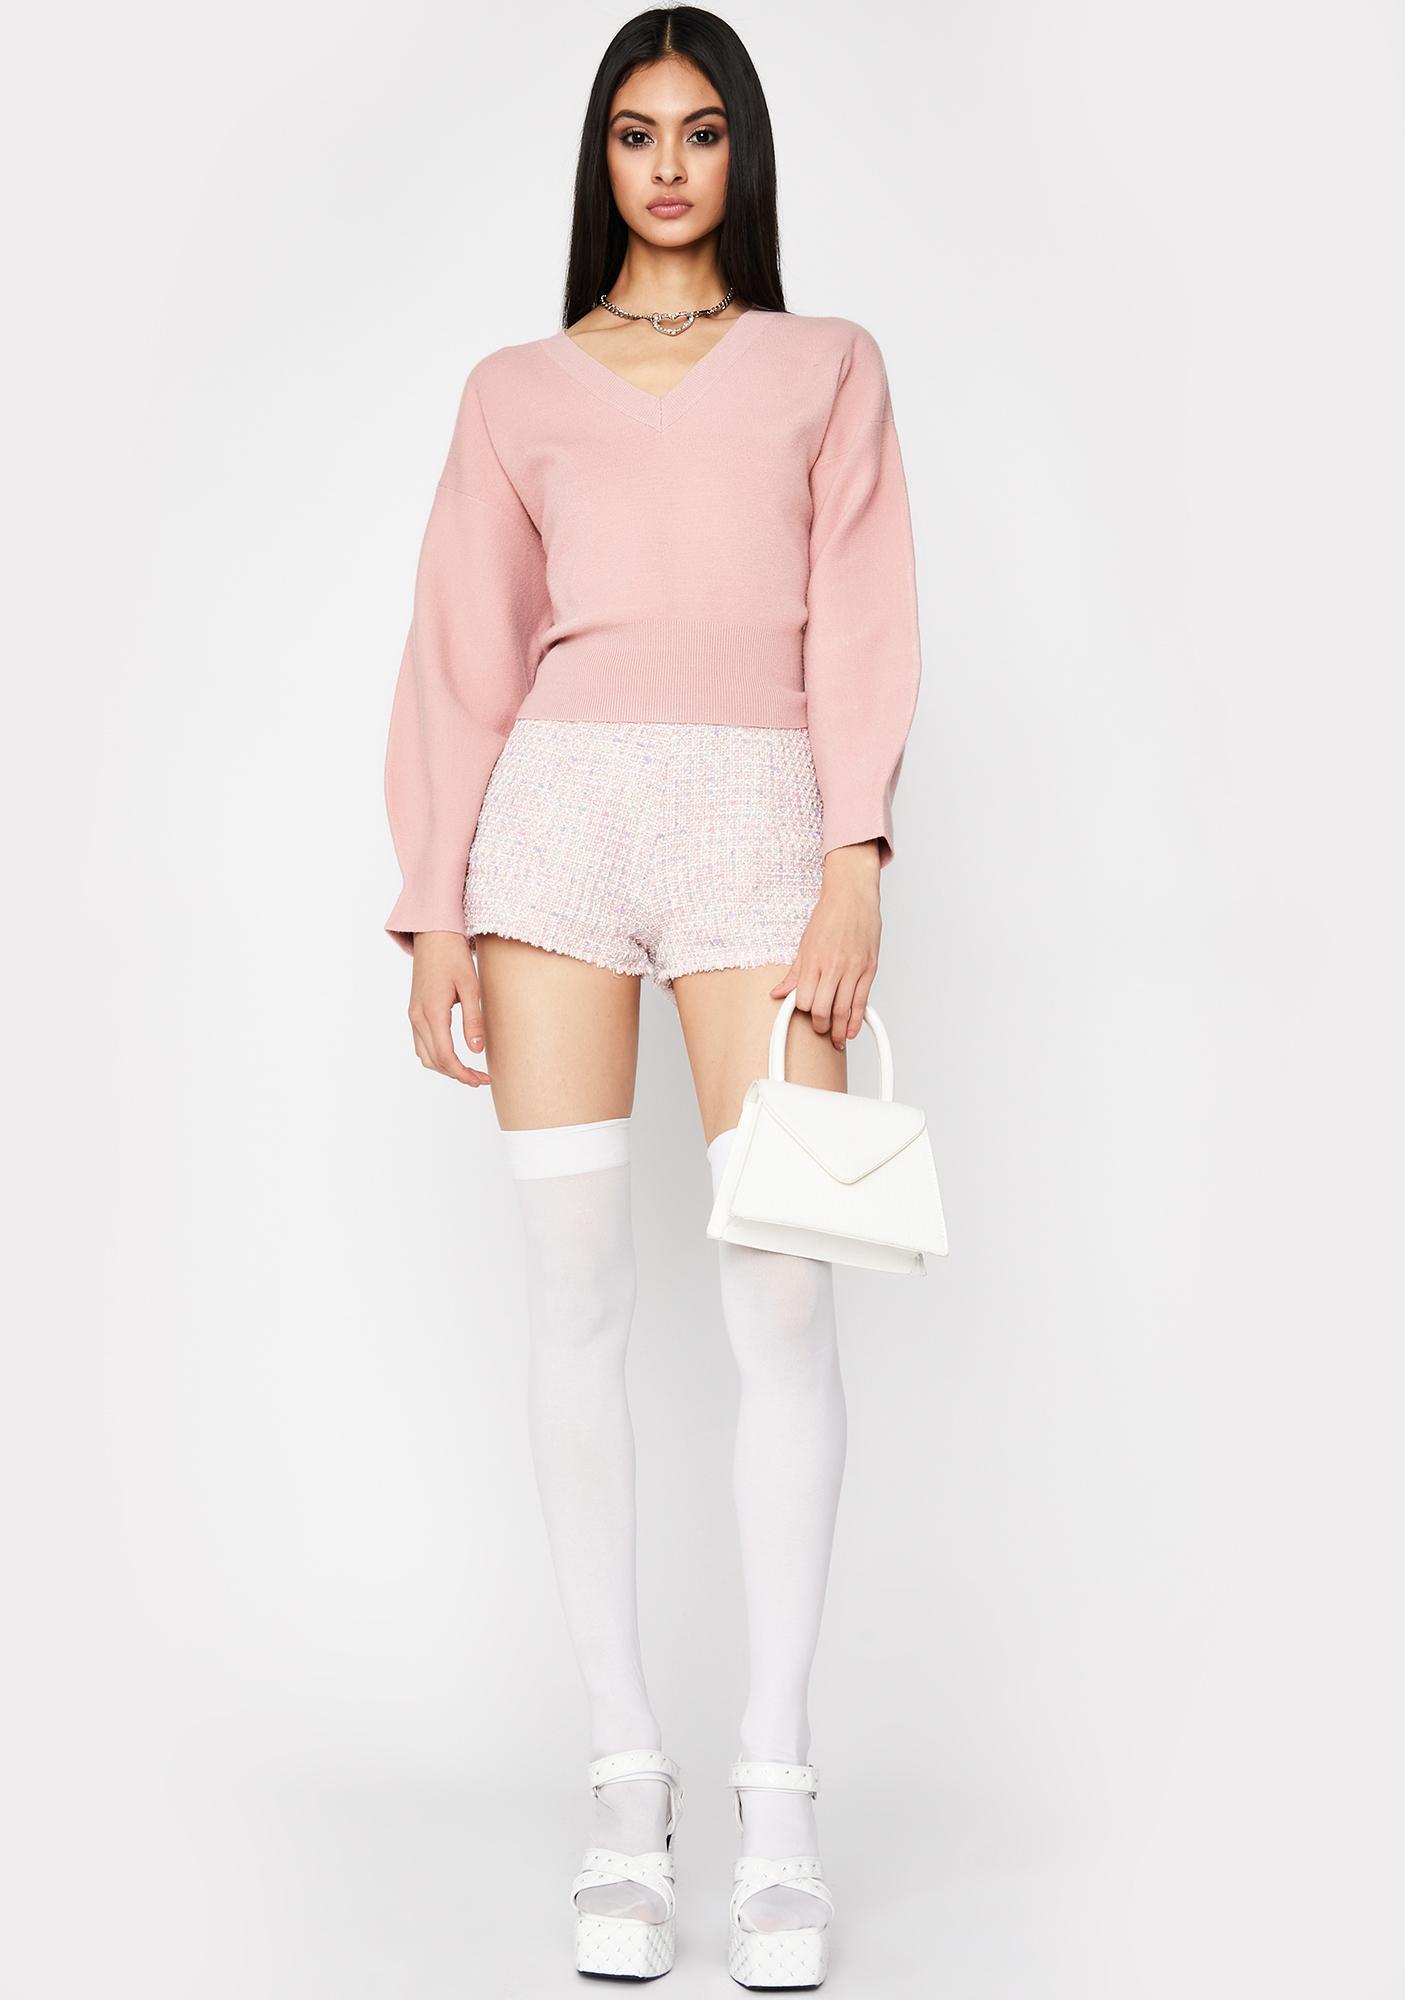 Blush Everyday Babe V Neck Sweater